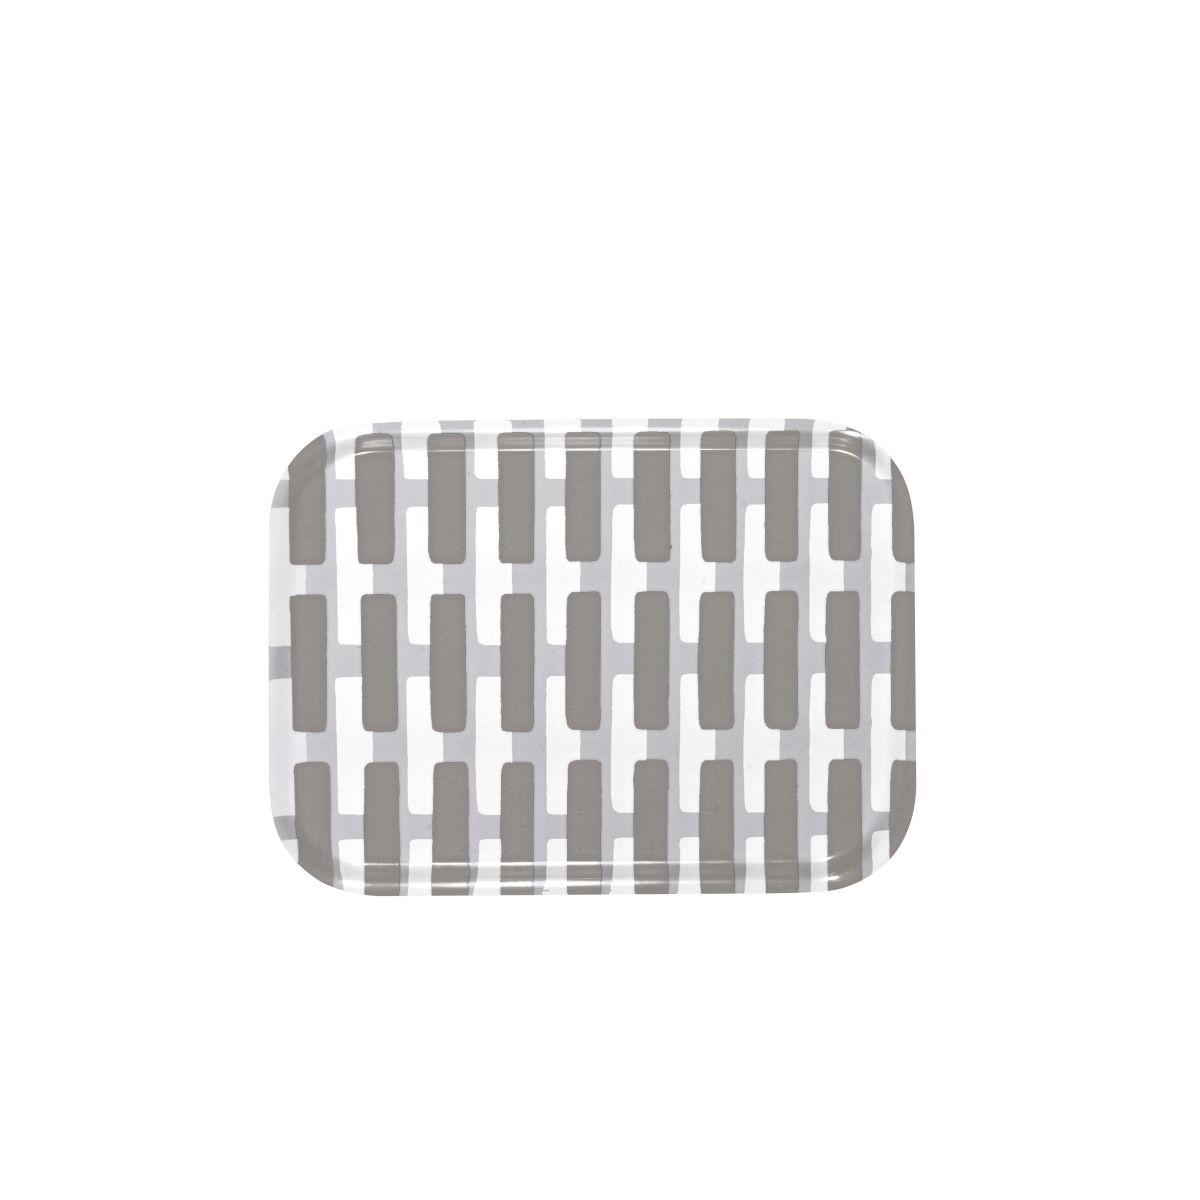 Siena-Tray-small-grey-light-grey-shadow-3977012